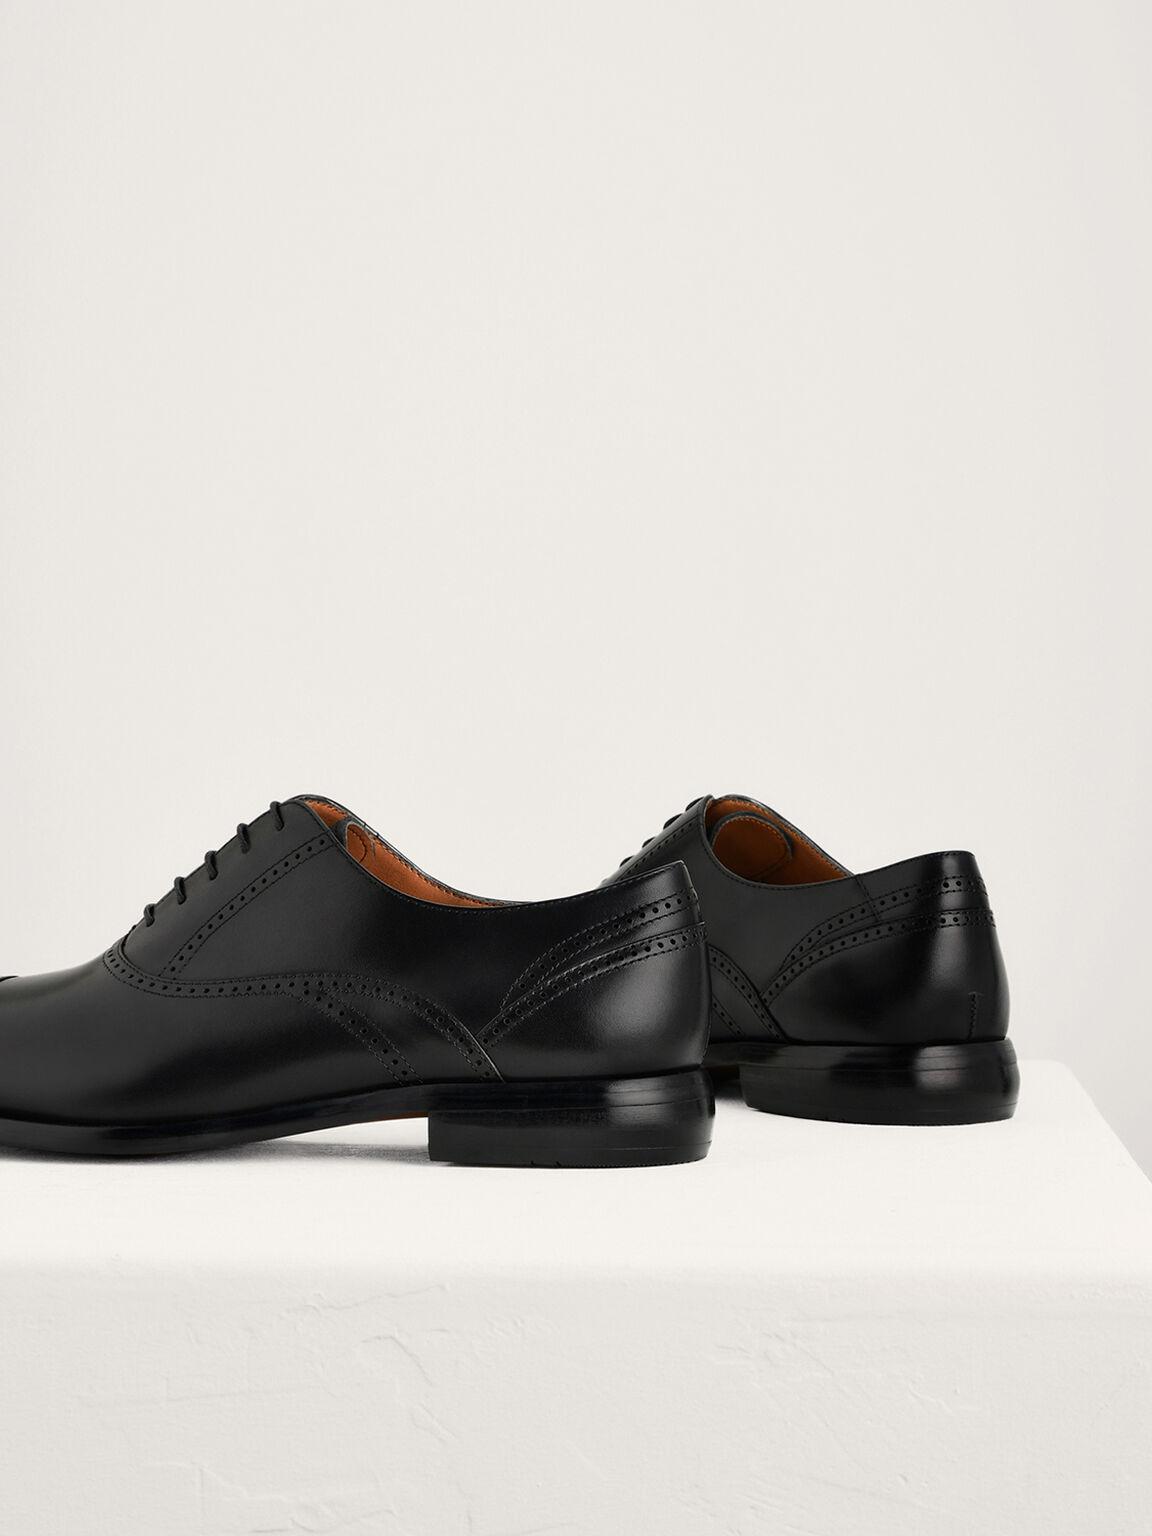 Leather Oxford Brogues, Black, hi-res